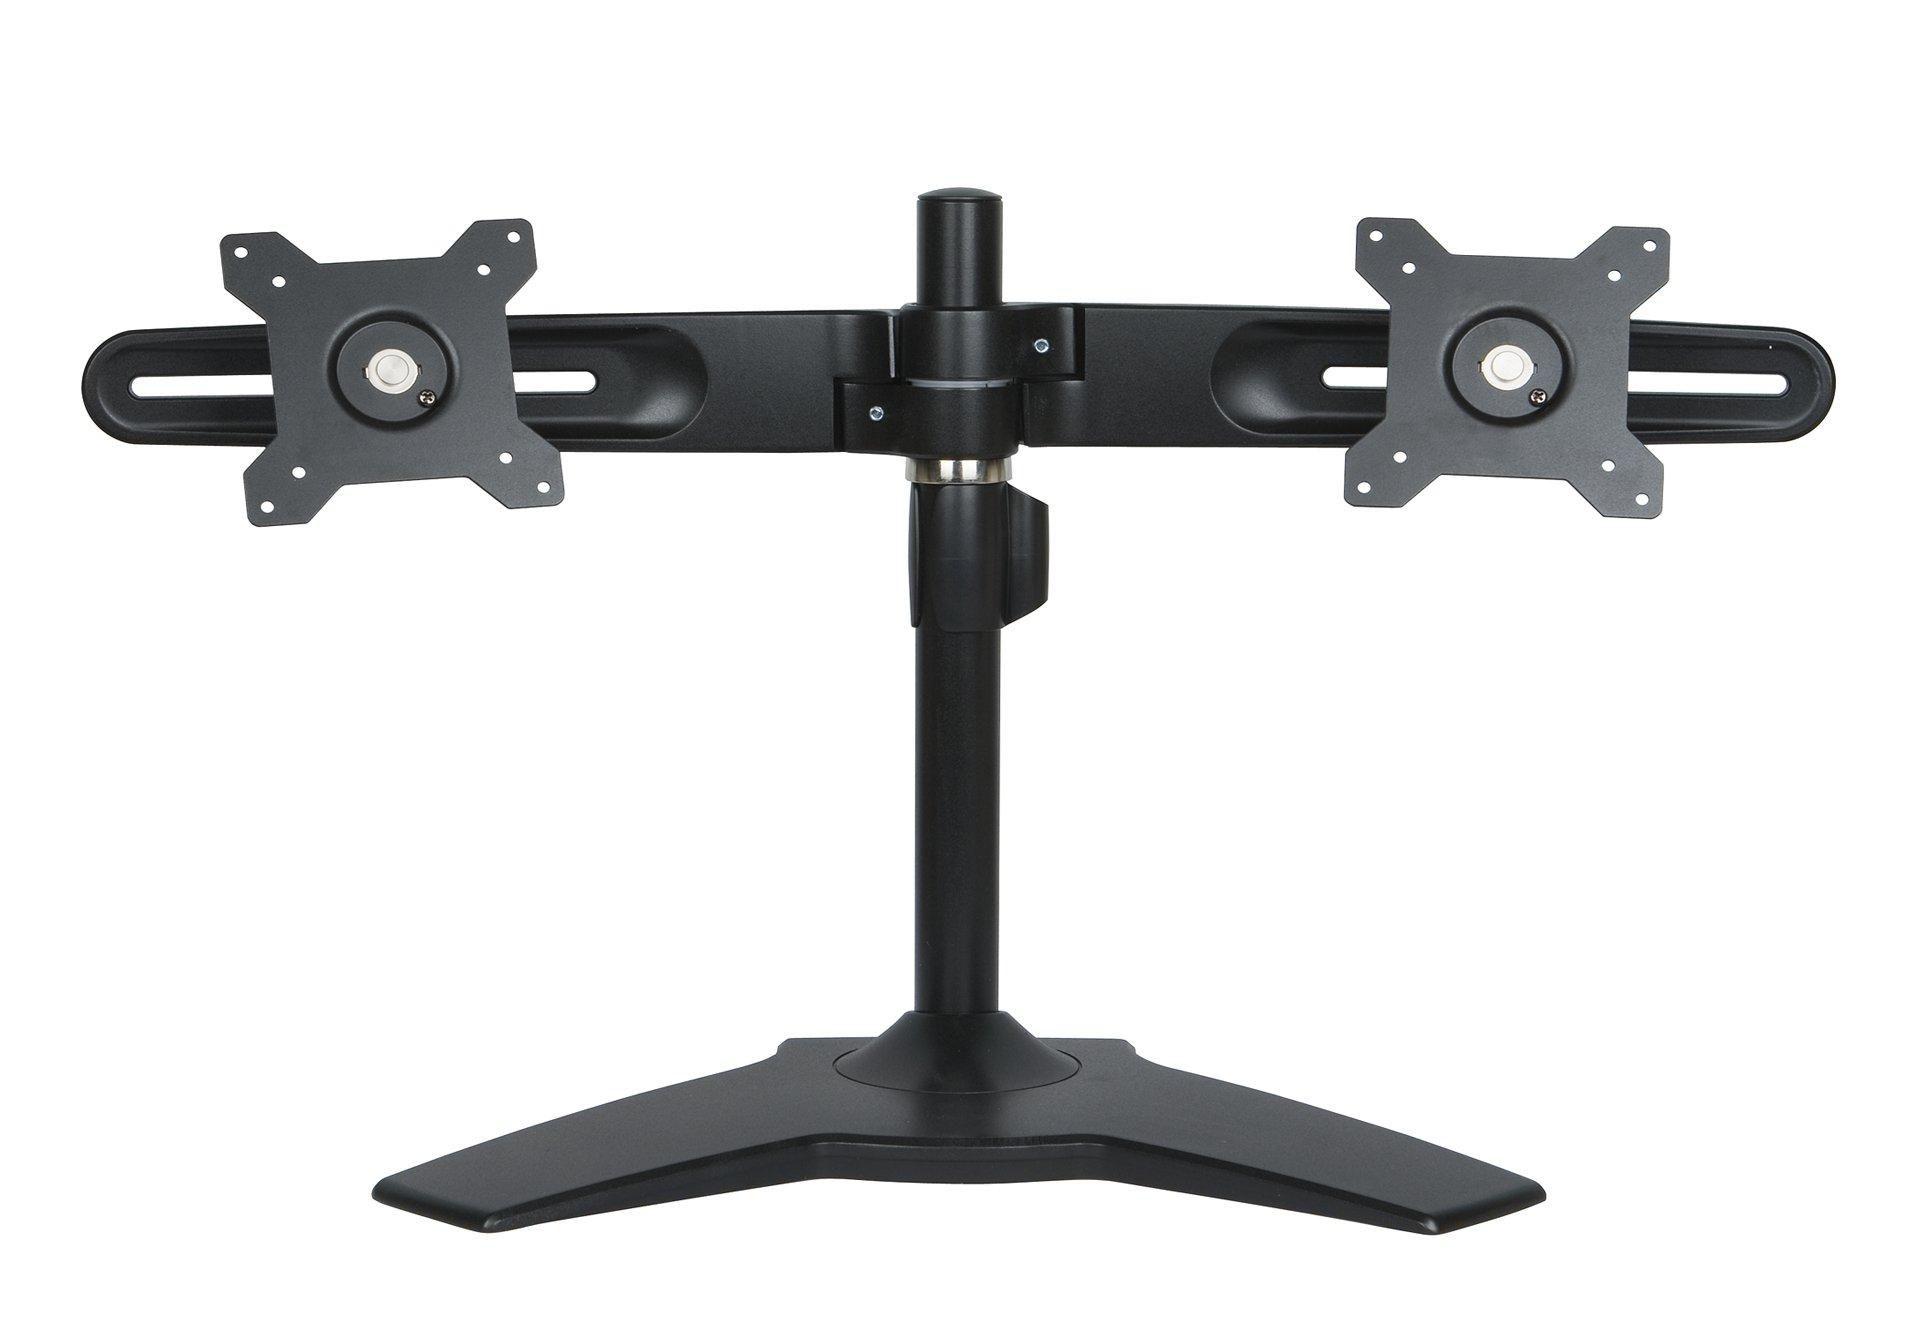 Planar Dual Monitor Stand, Black (997-5253-00) by Planar